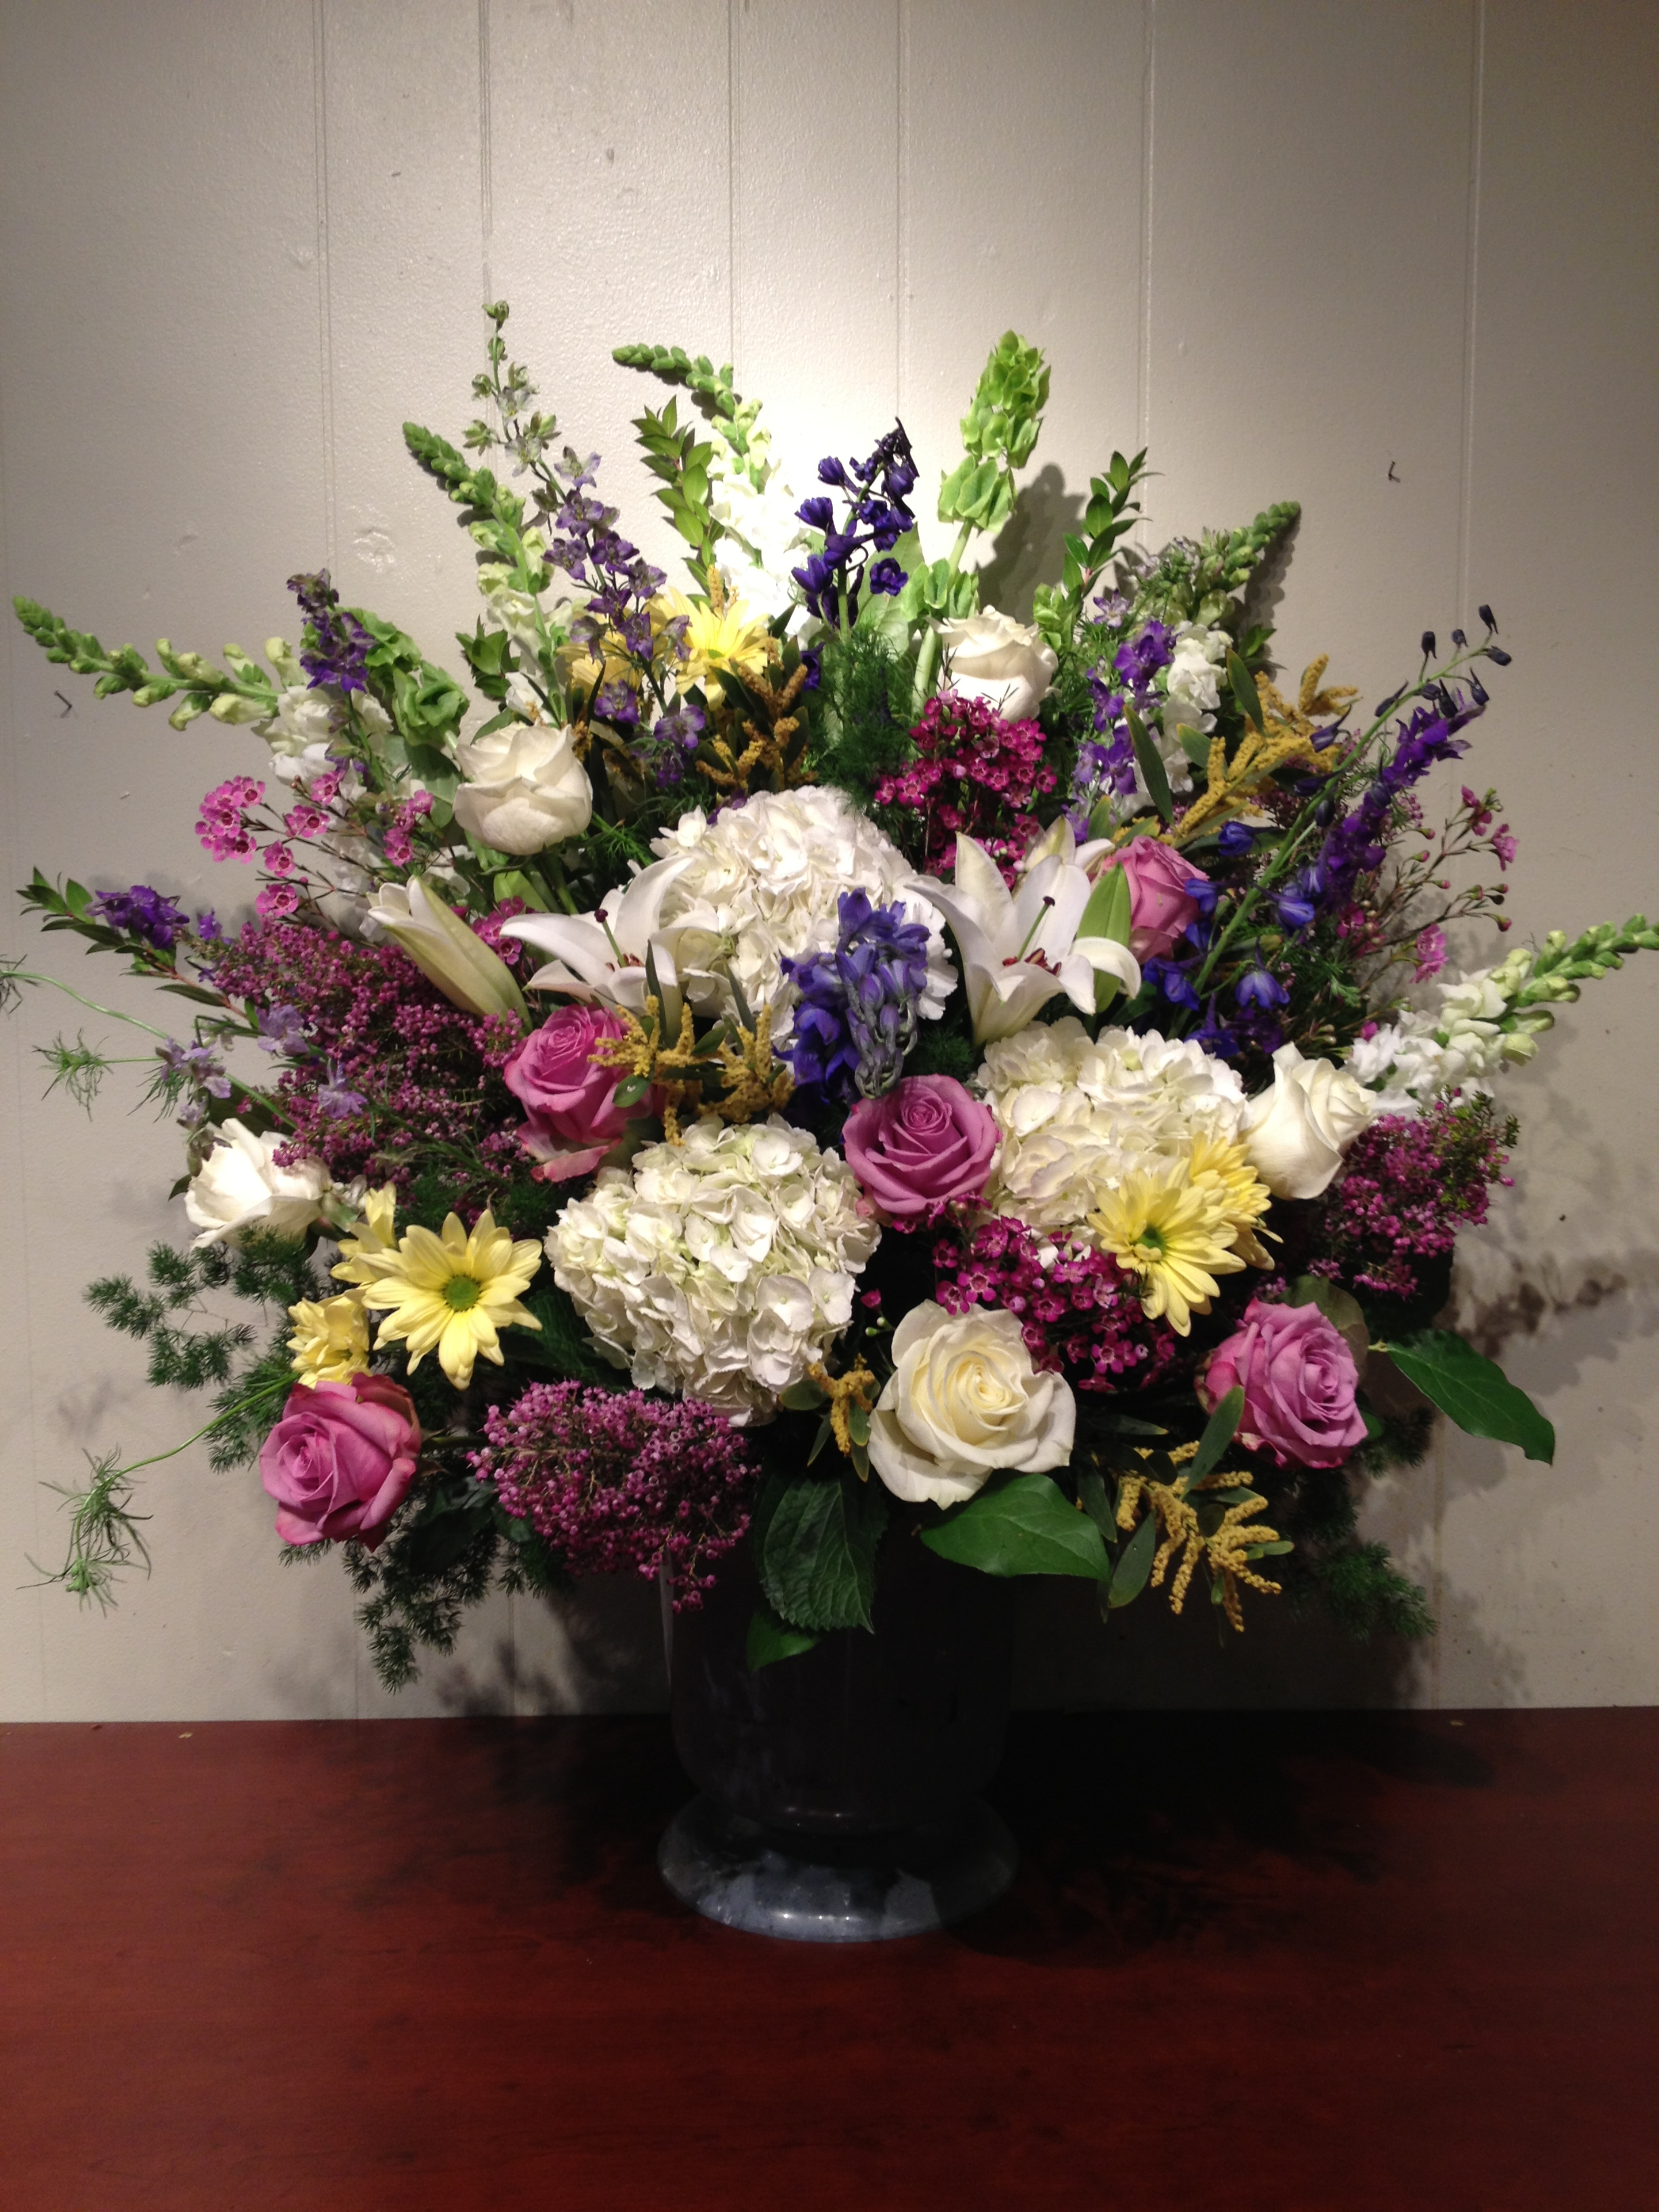 Funeralflowers funeral flowers izmirmasajfo Choice Image